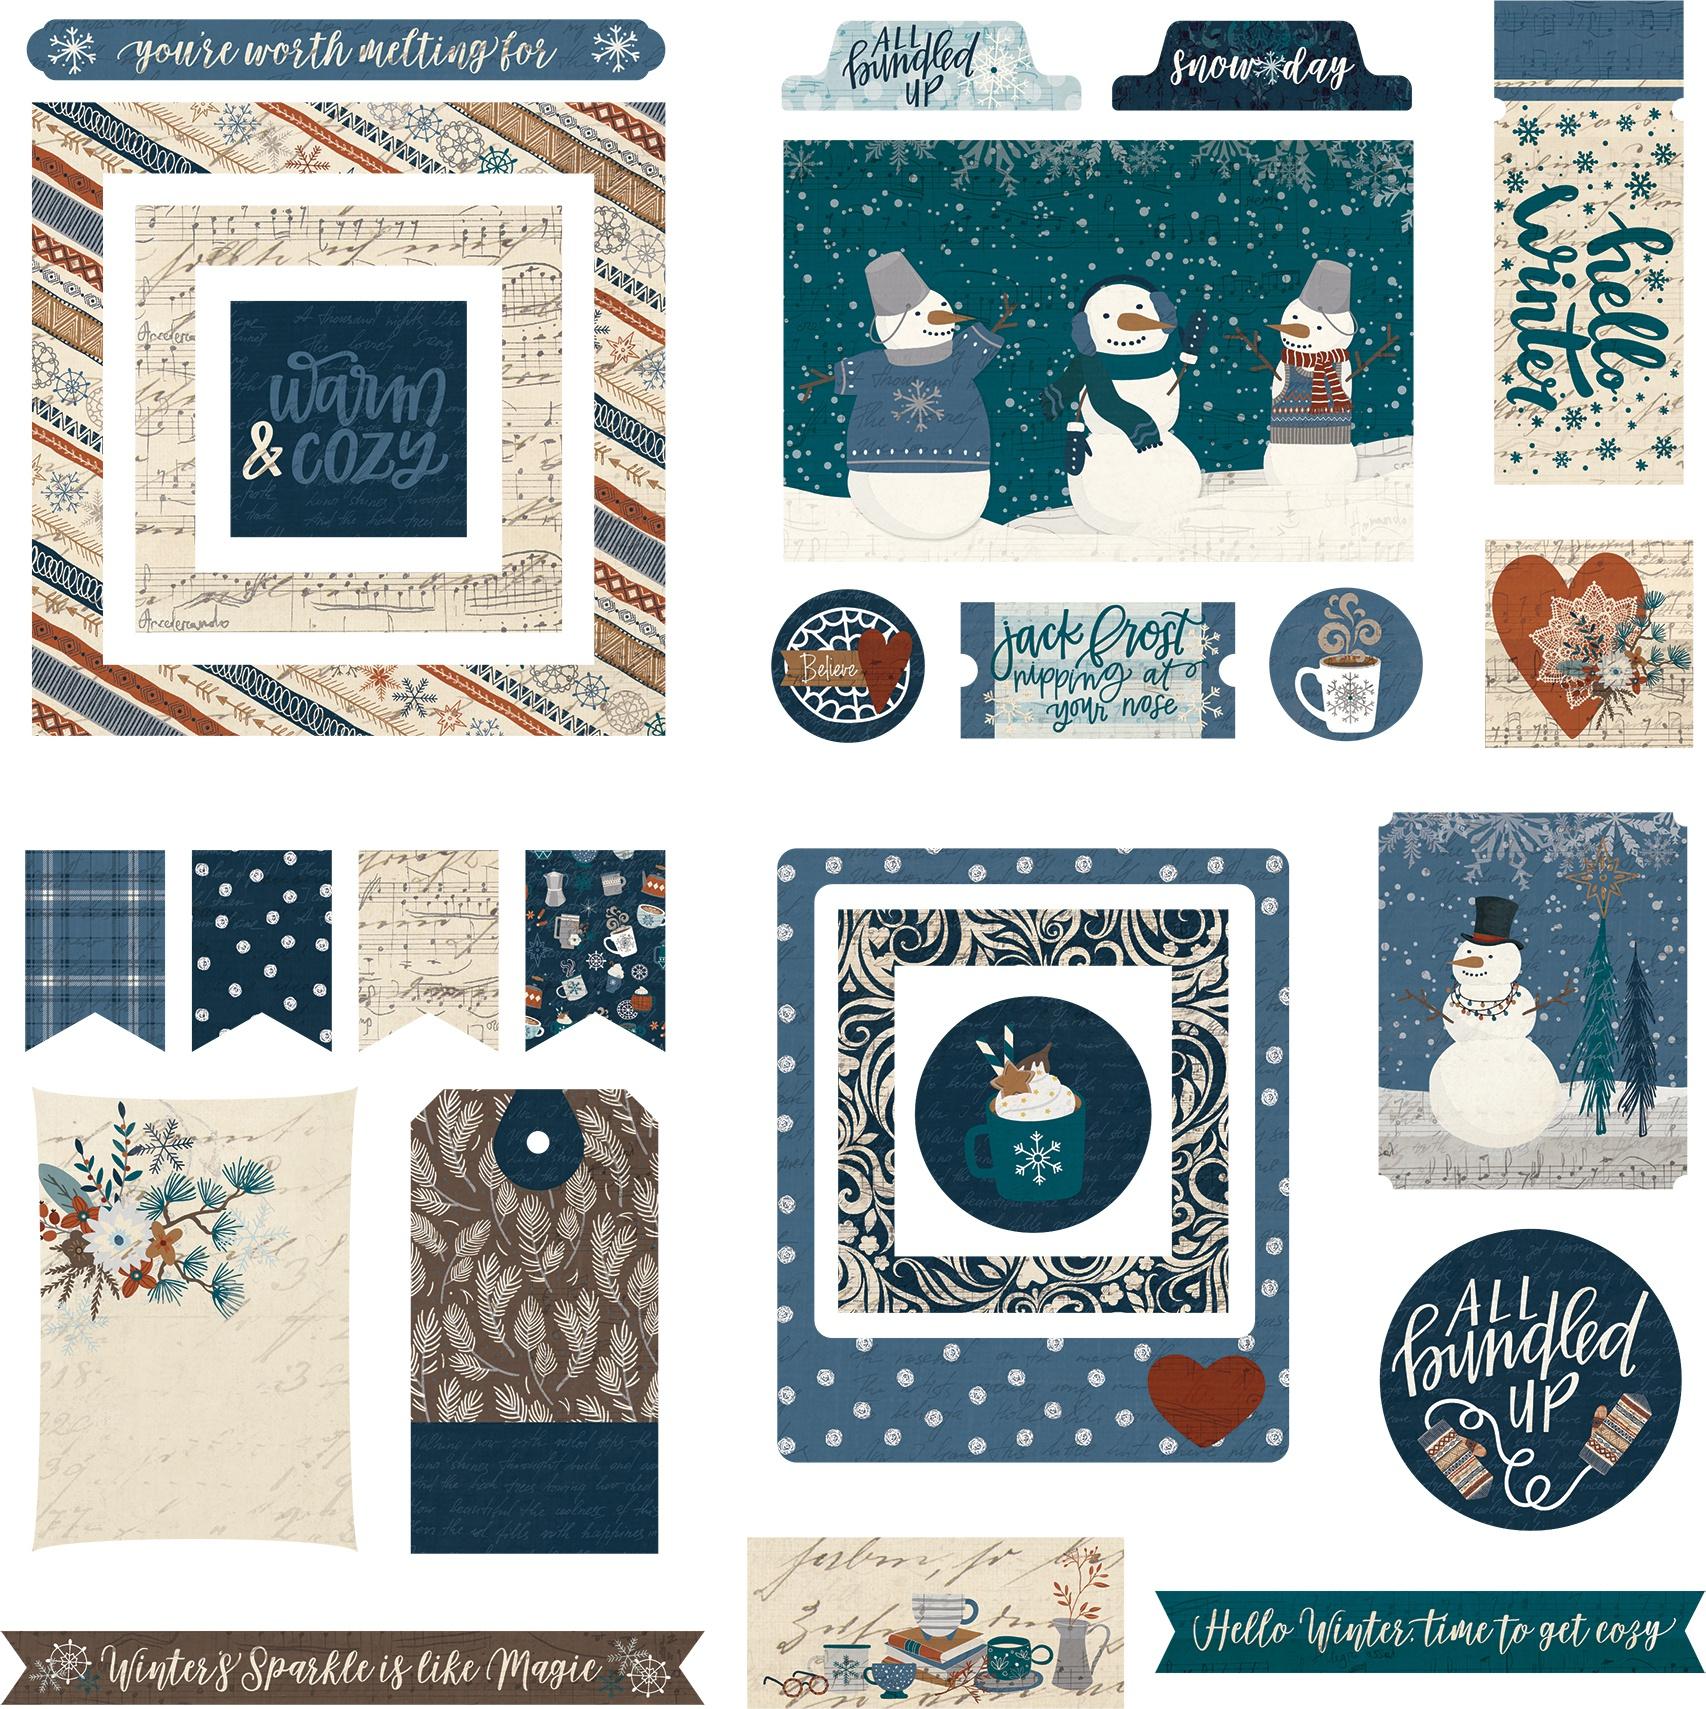 For The Love Of Winter Ephemera Cardstock Die-Cuts-